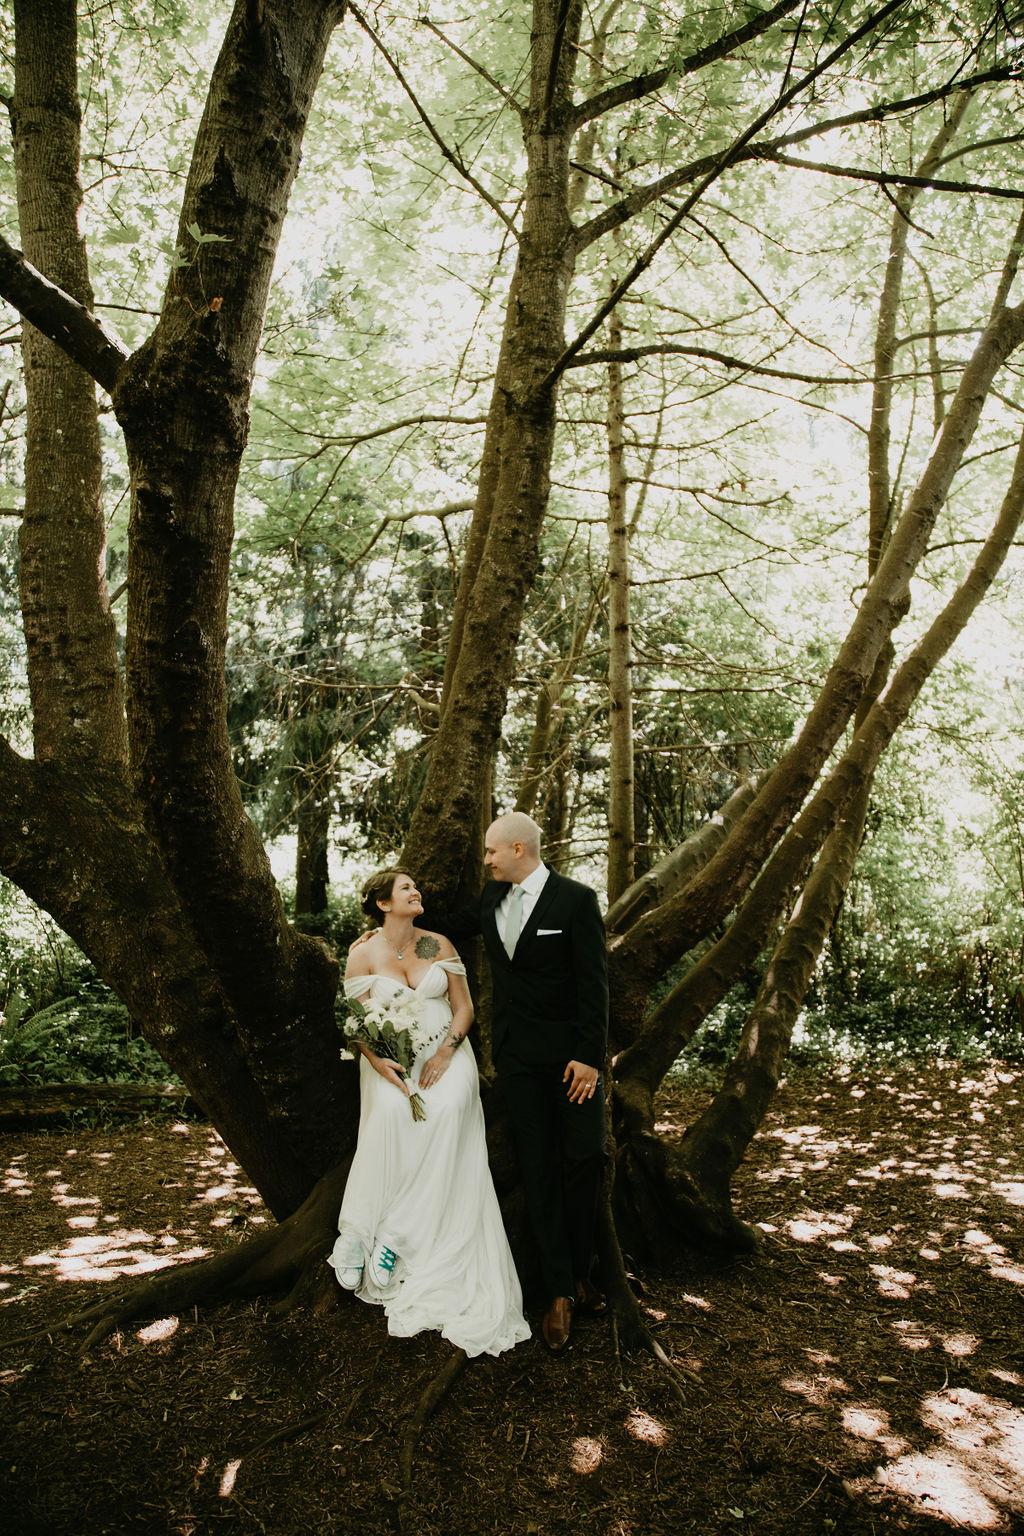 Saxe Point Park elopement in Victoria